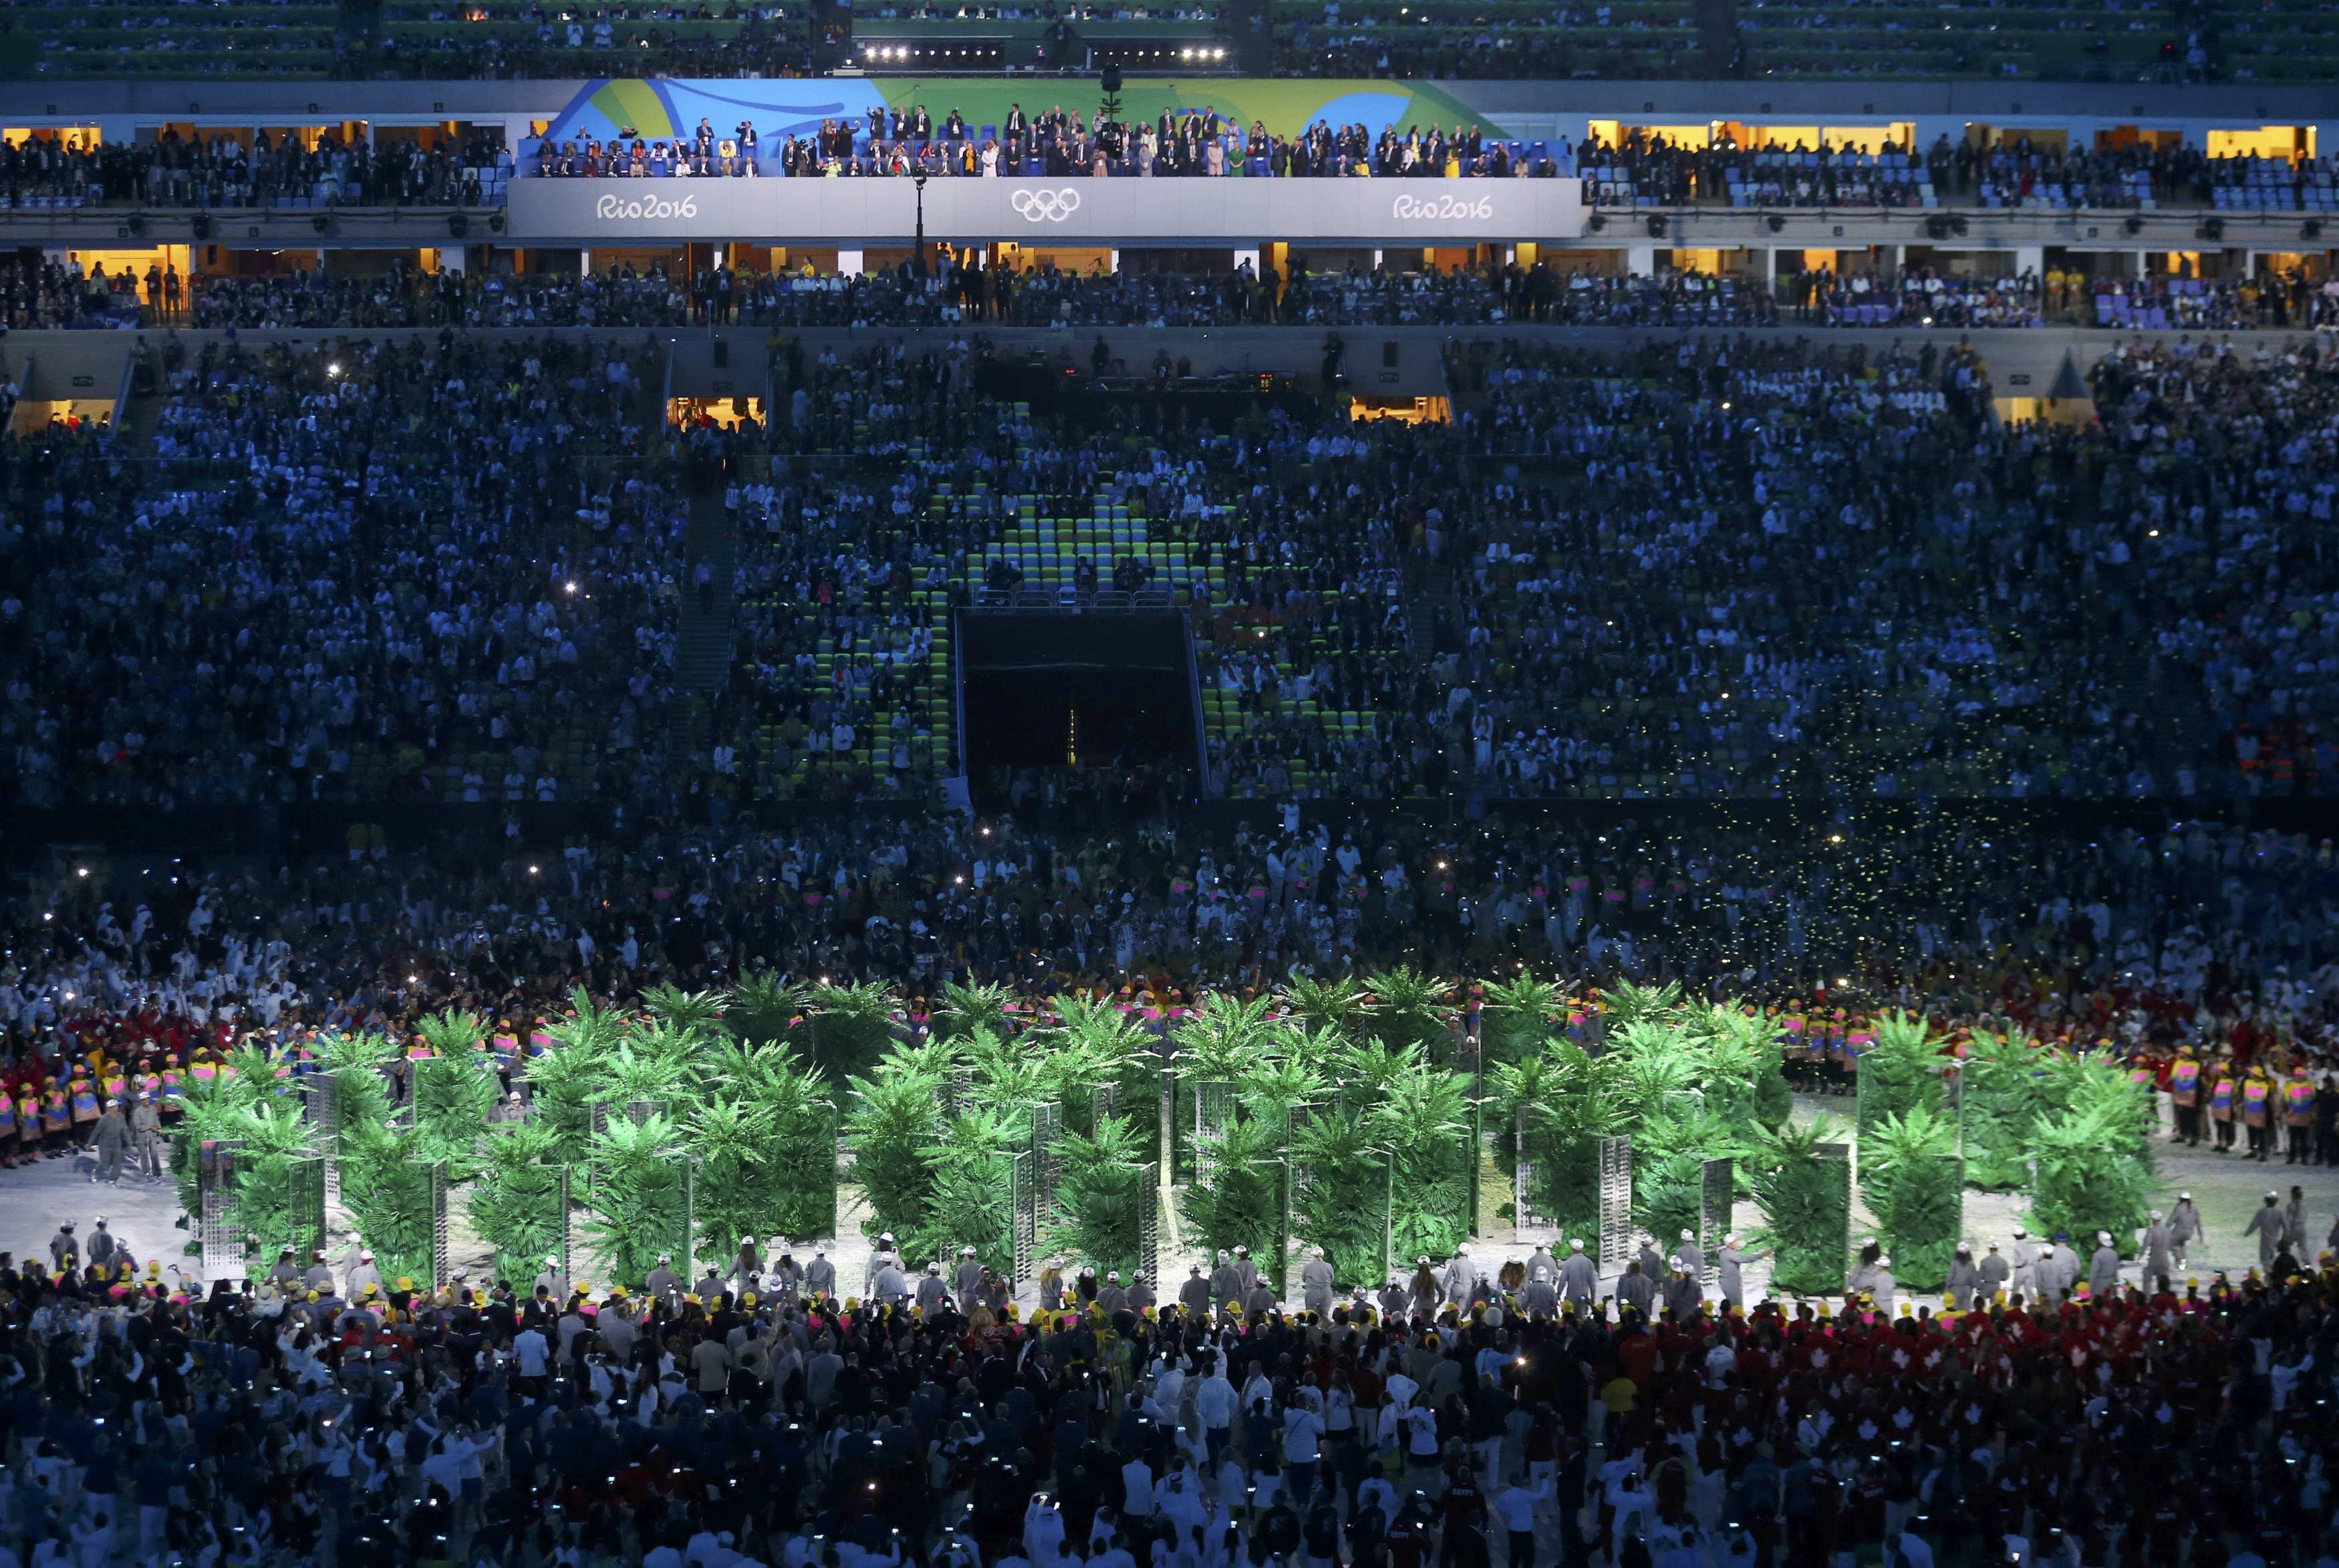 Rio kicks off 2016 Olympics